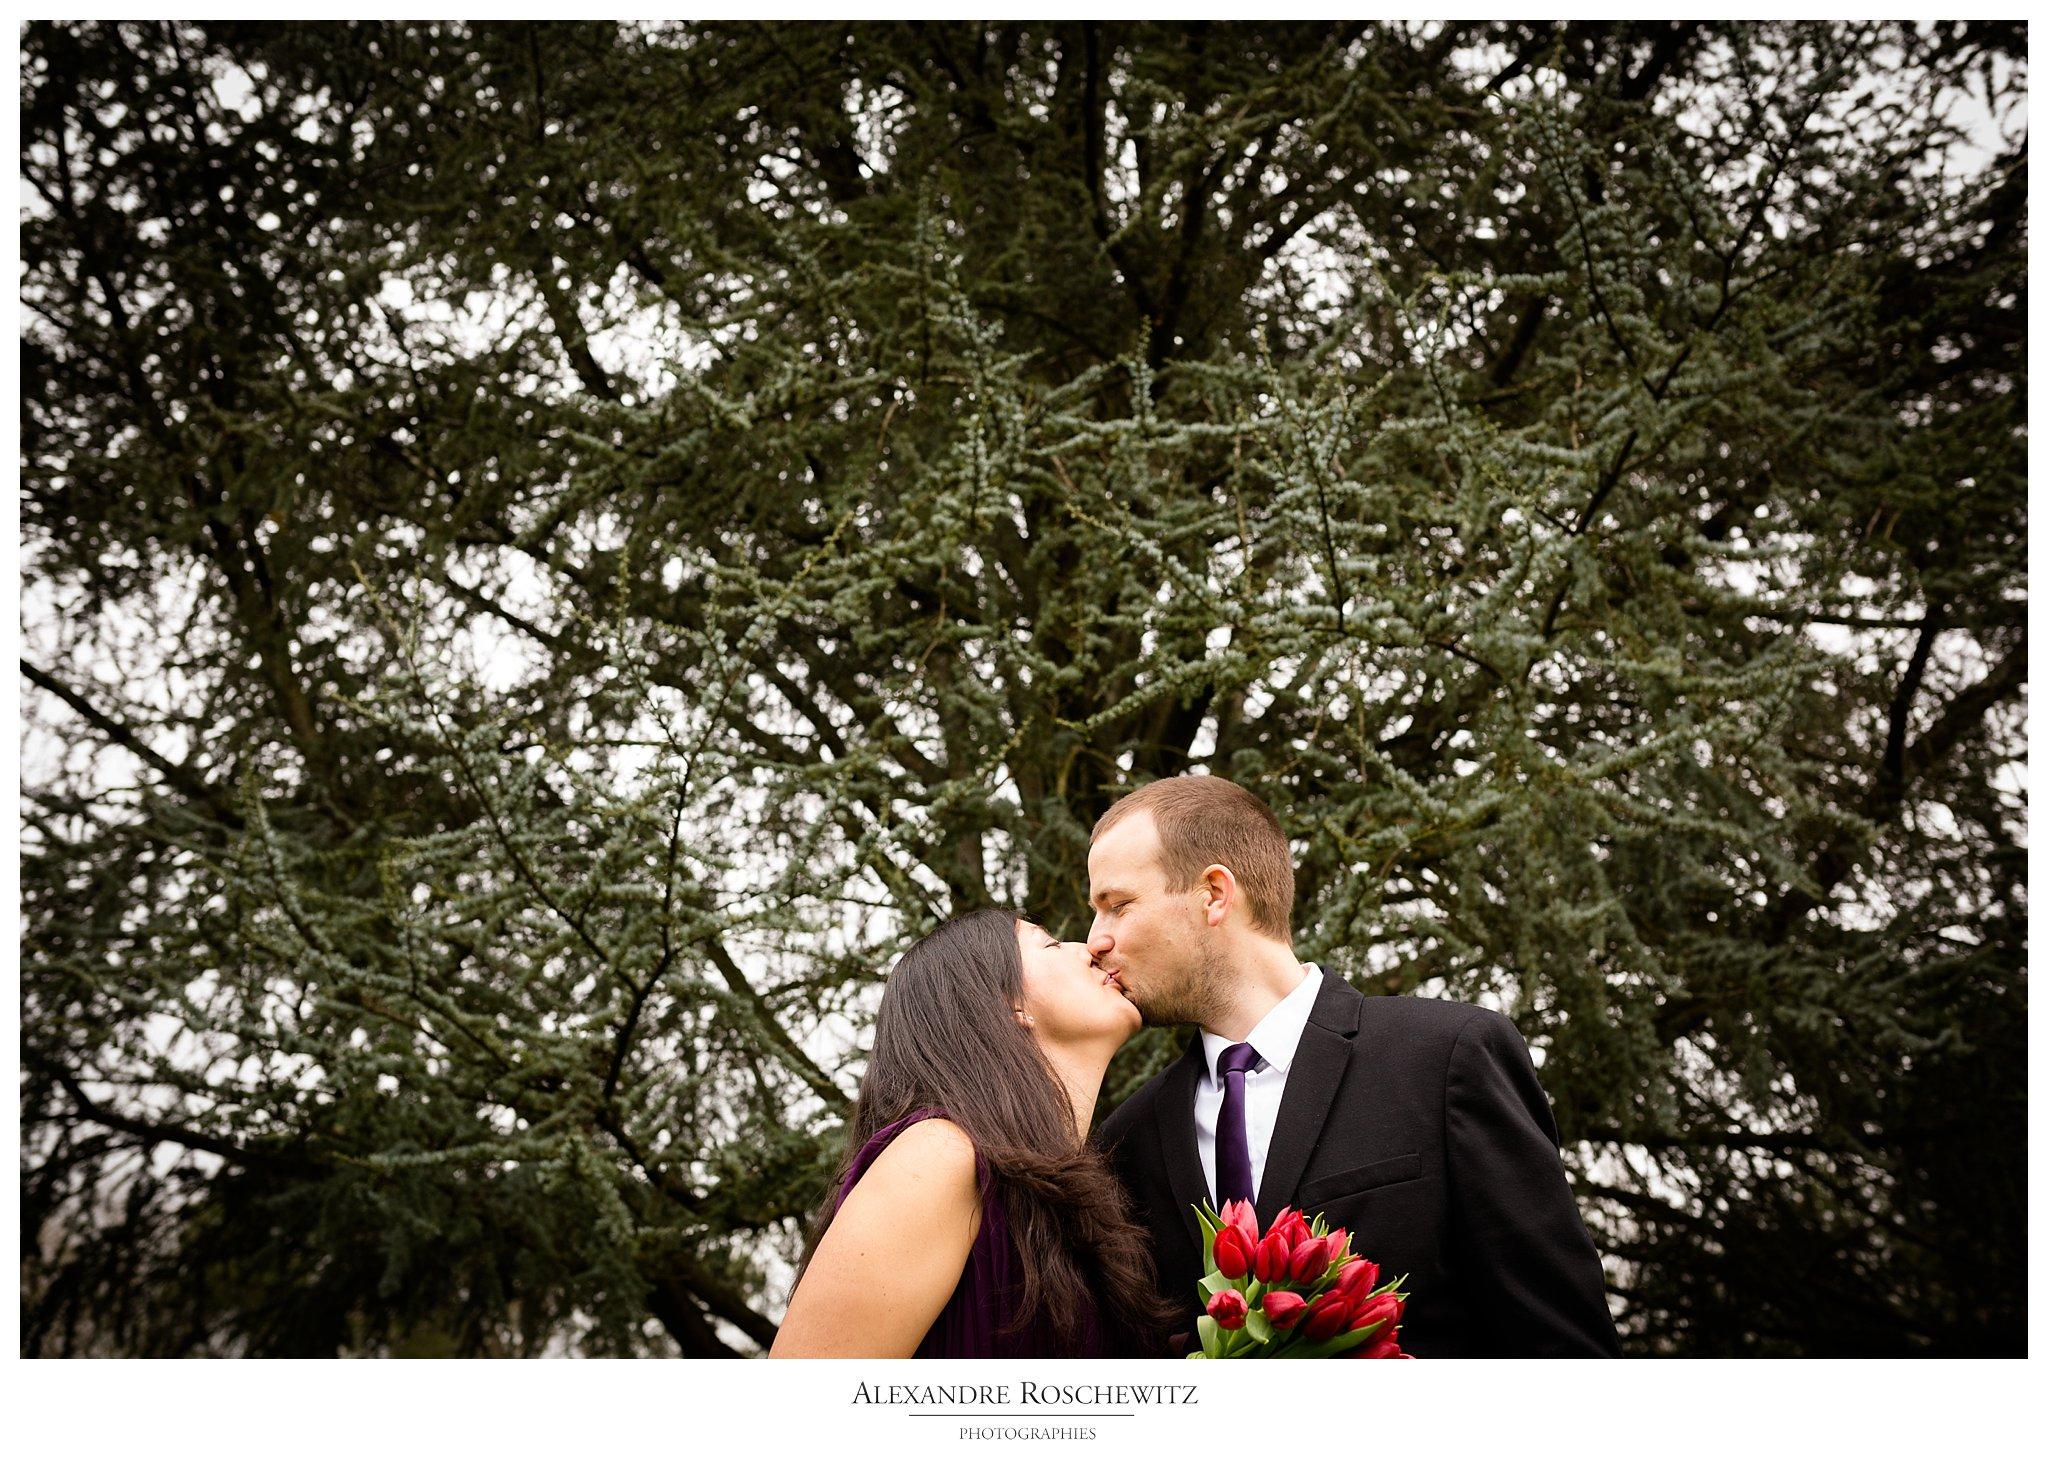 Photographe mariage civil à Mérignac – Yohana + Olivier